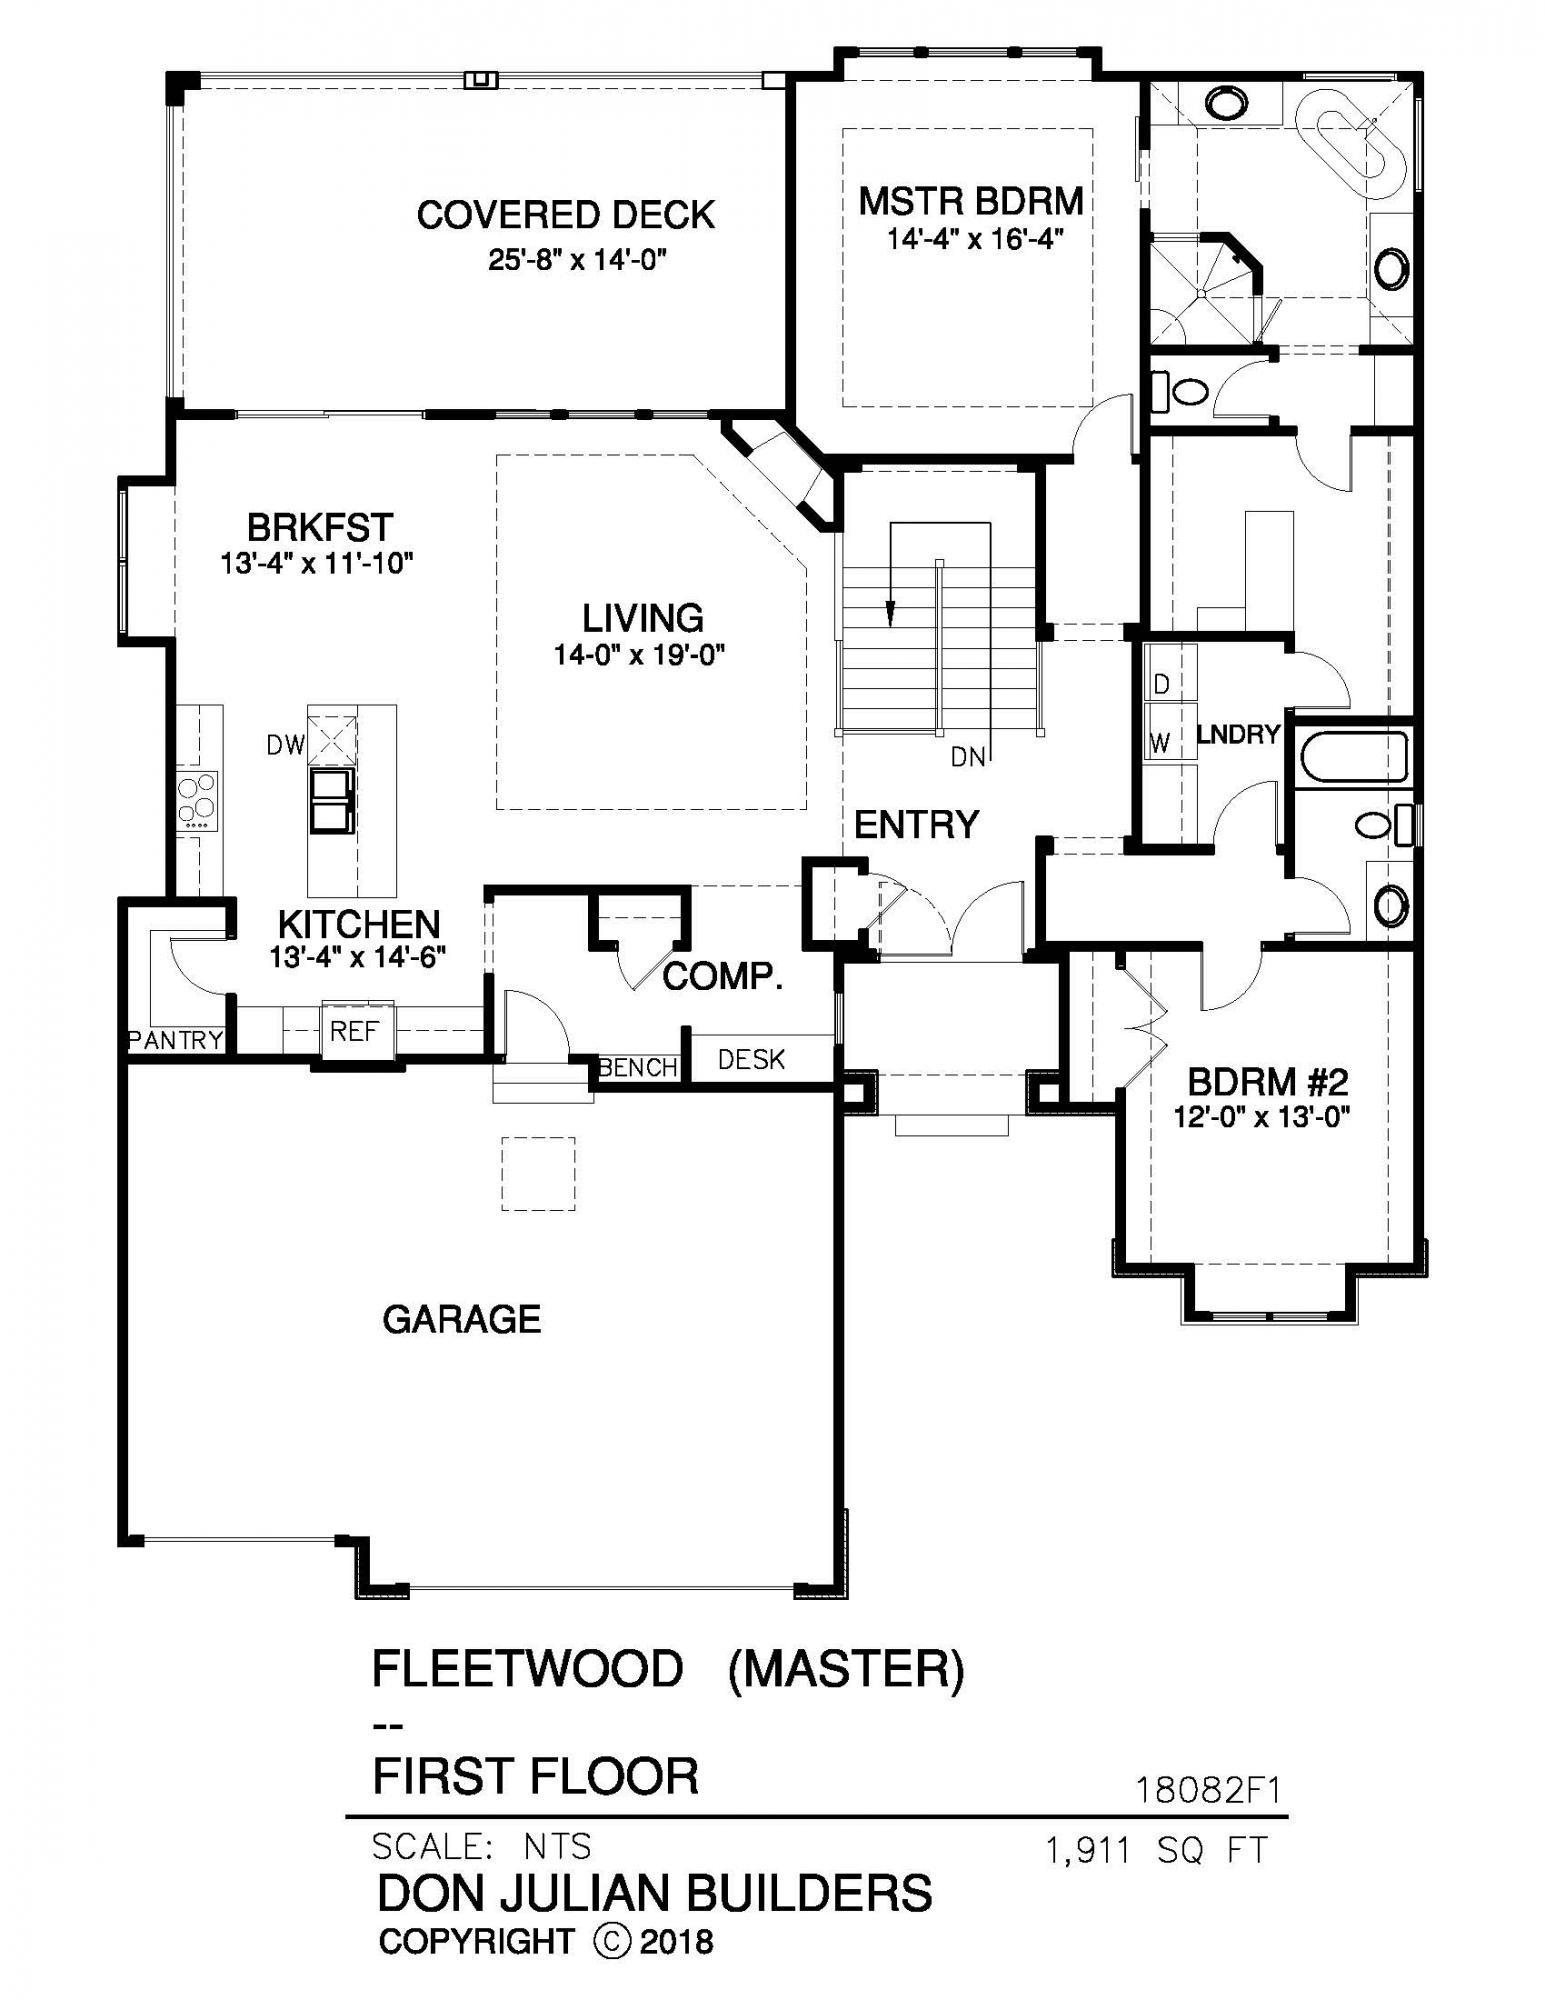 the fleetwood fp.jpg